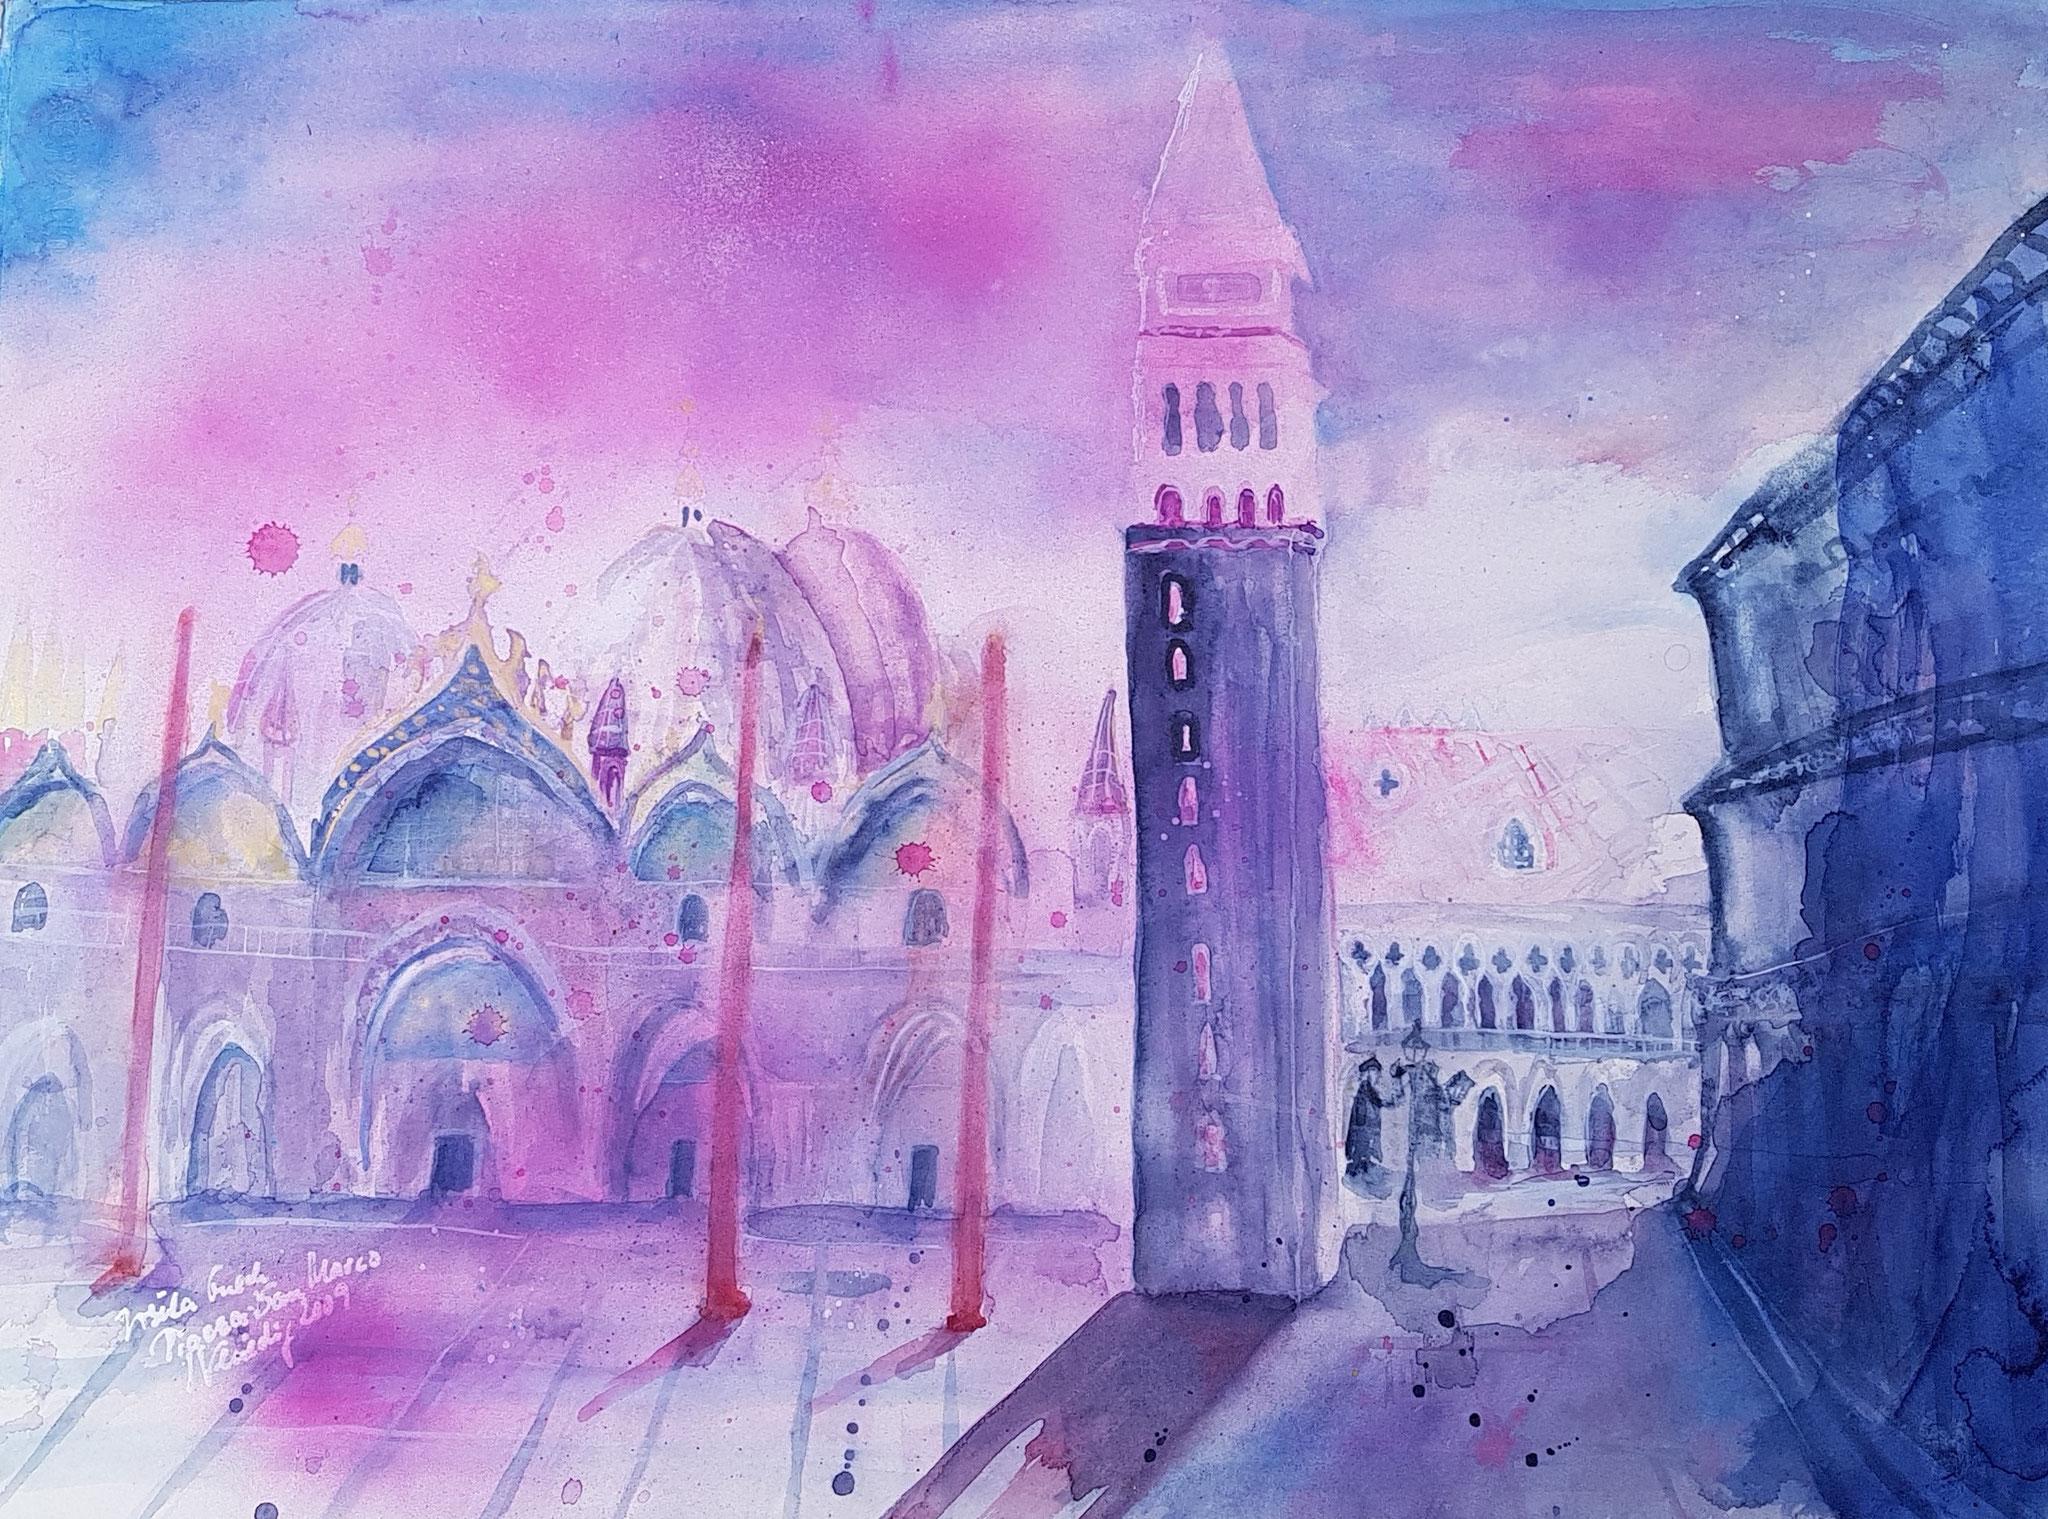 Piazza San Marco Venezia (Technik: Aquarell auf Fabriano 600 g Satinata 76 X 56 cm)